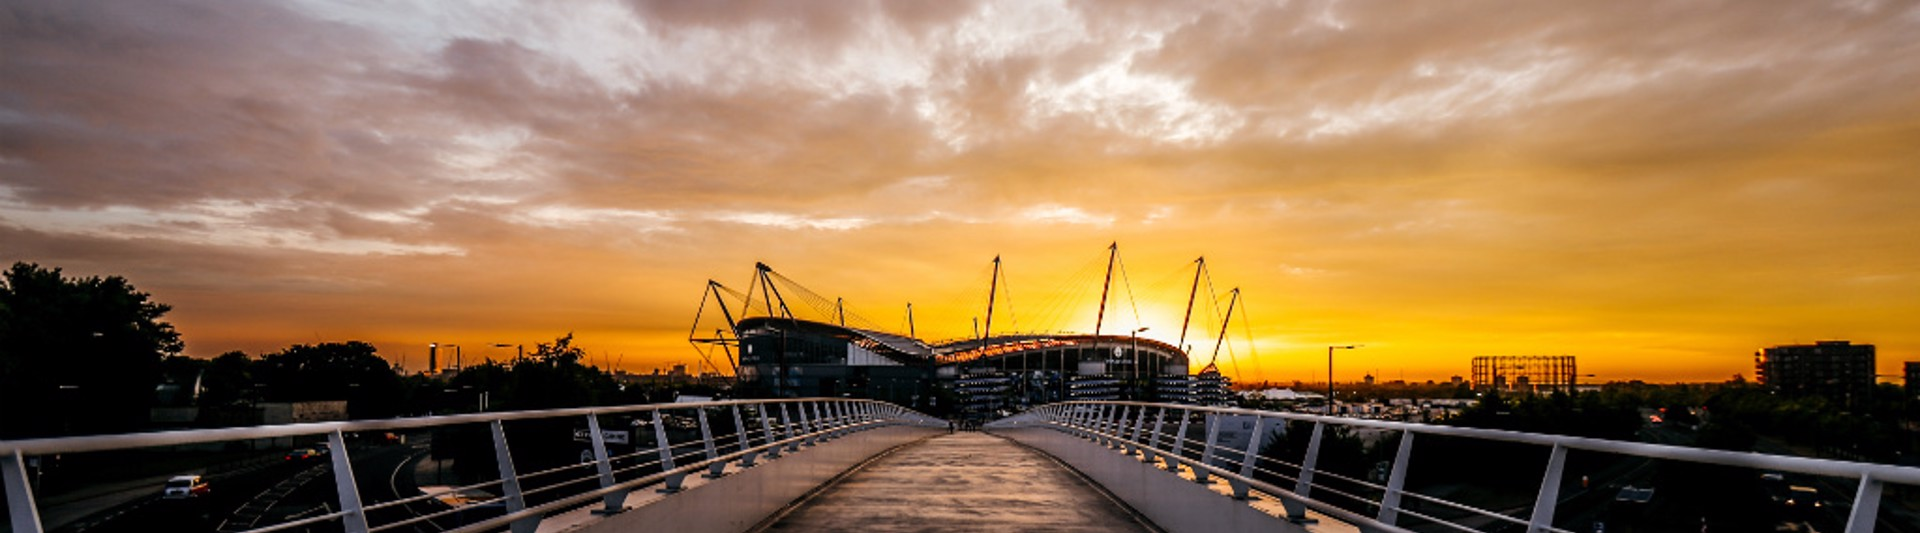 BEAUTIFUL: The sun shines on City!